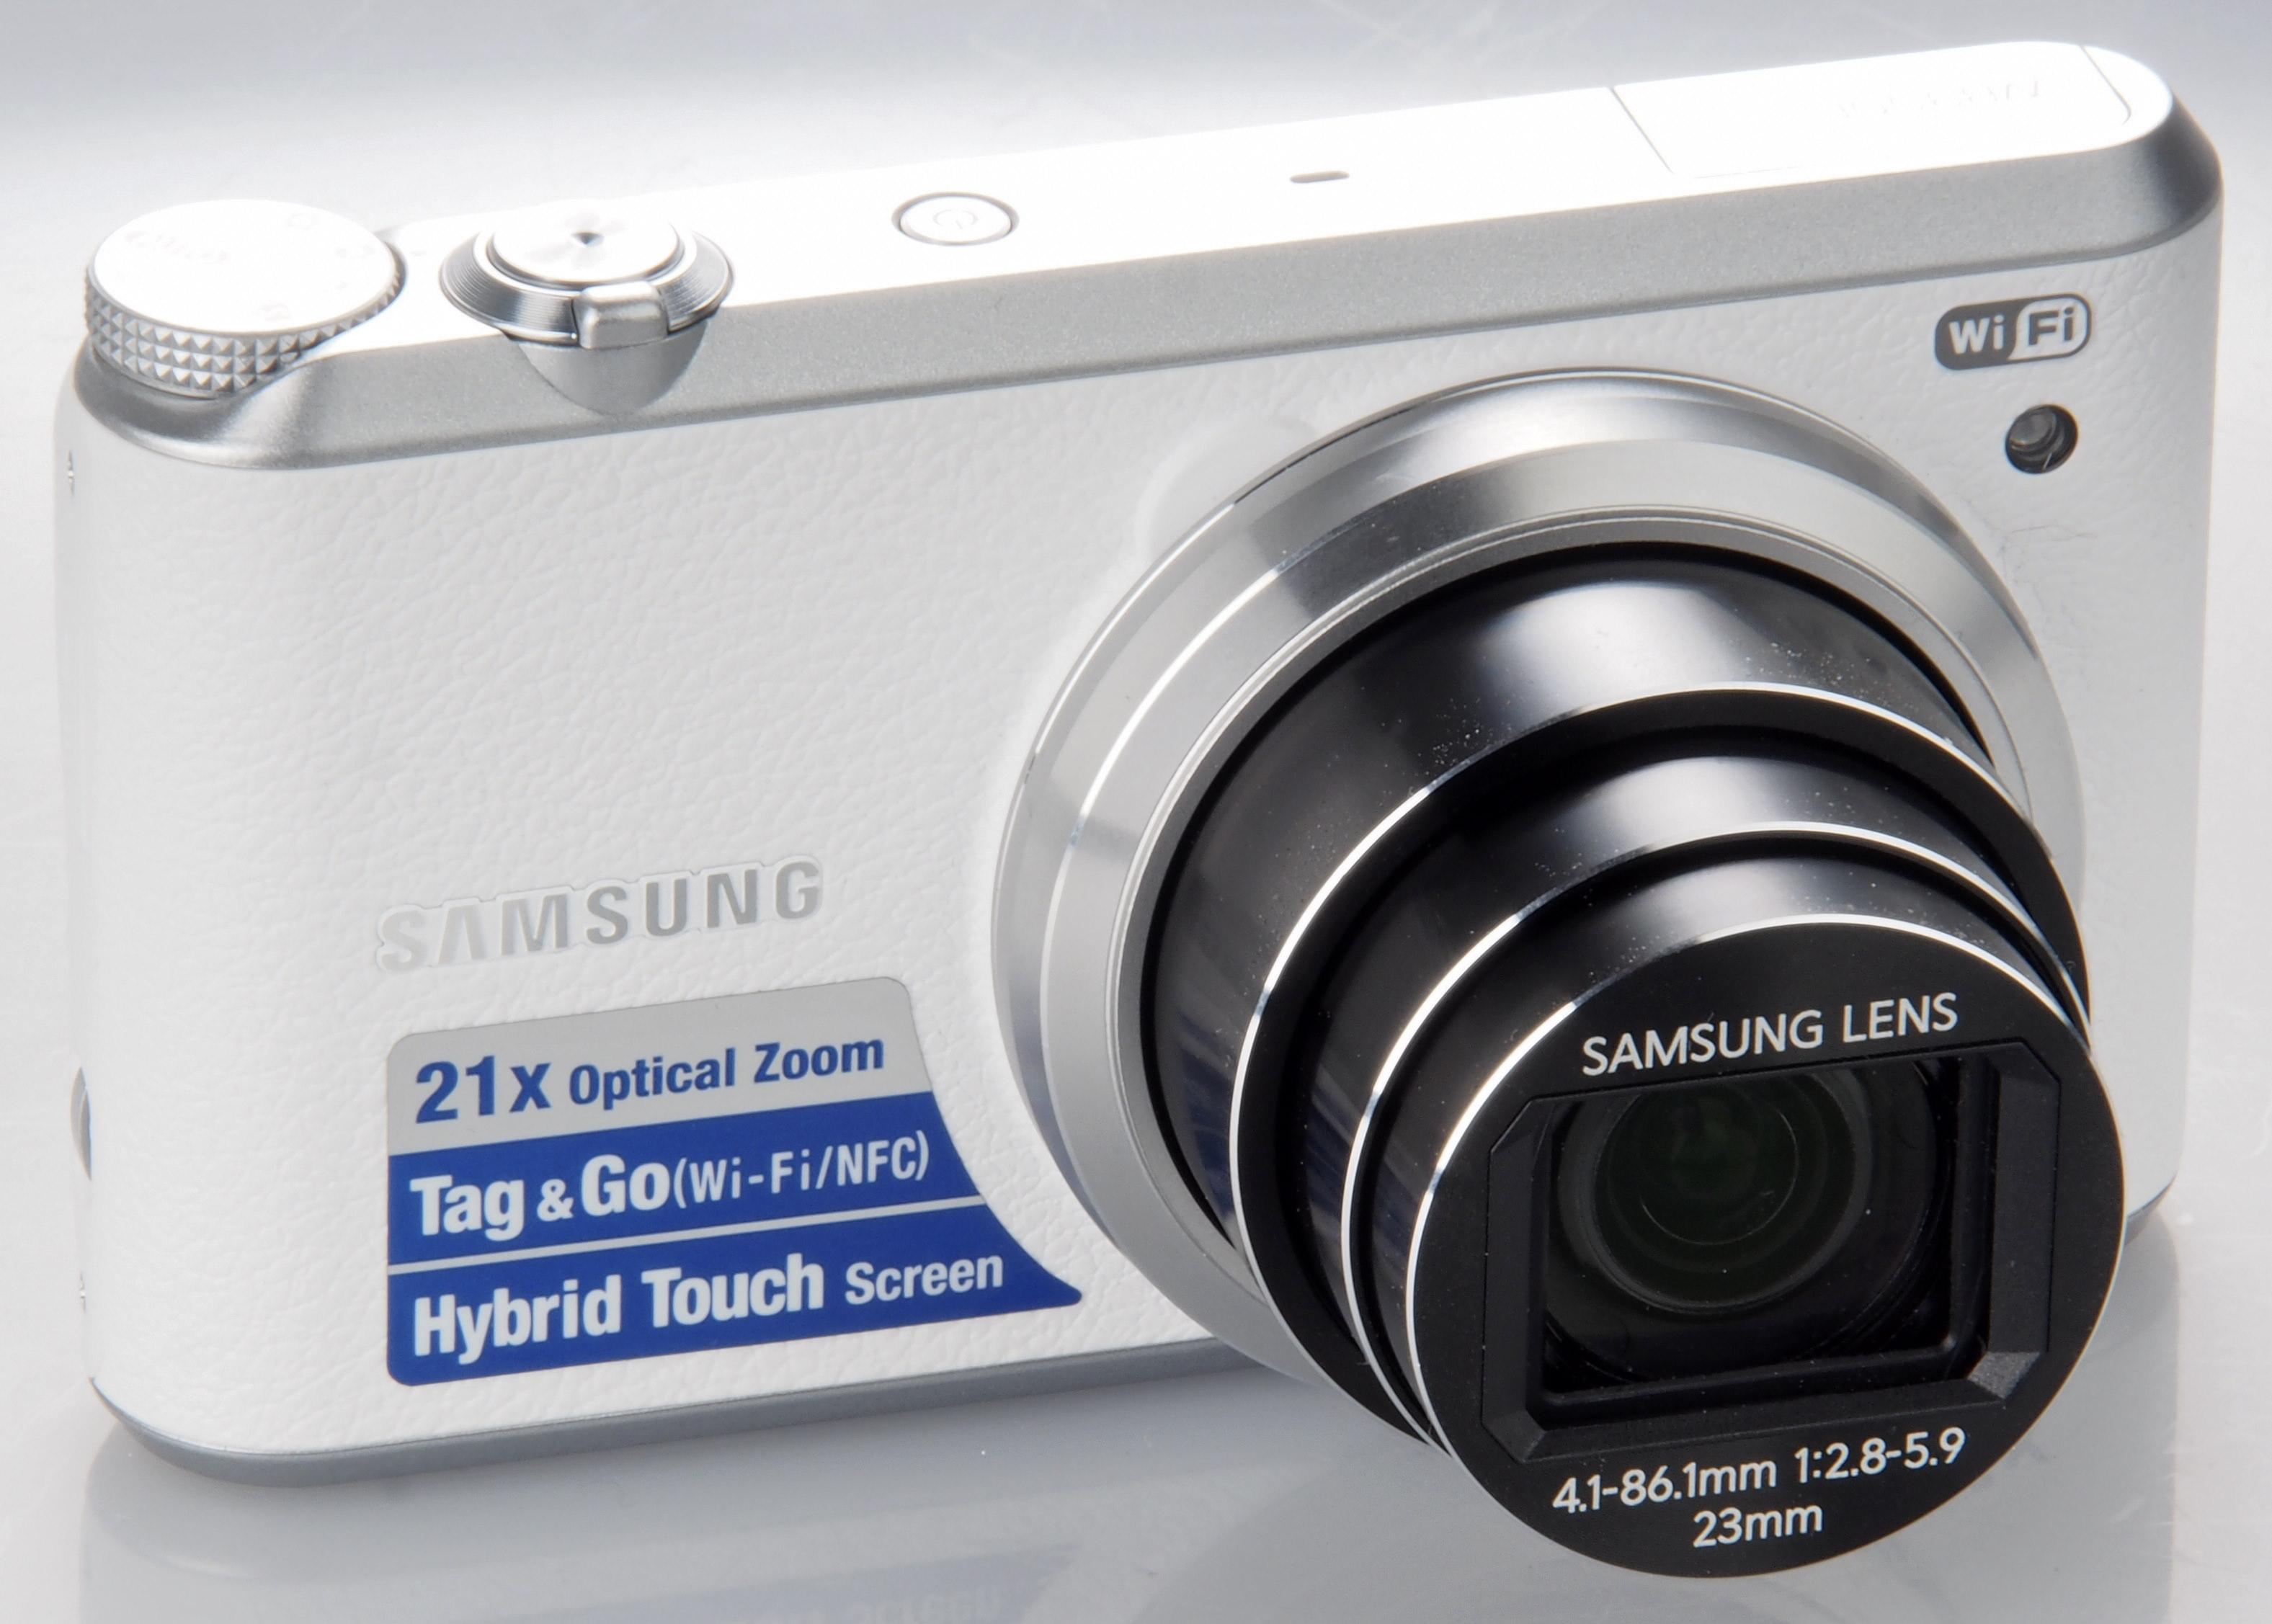 samsung 21x optical zoom camera manual